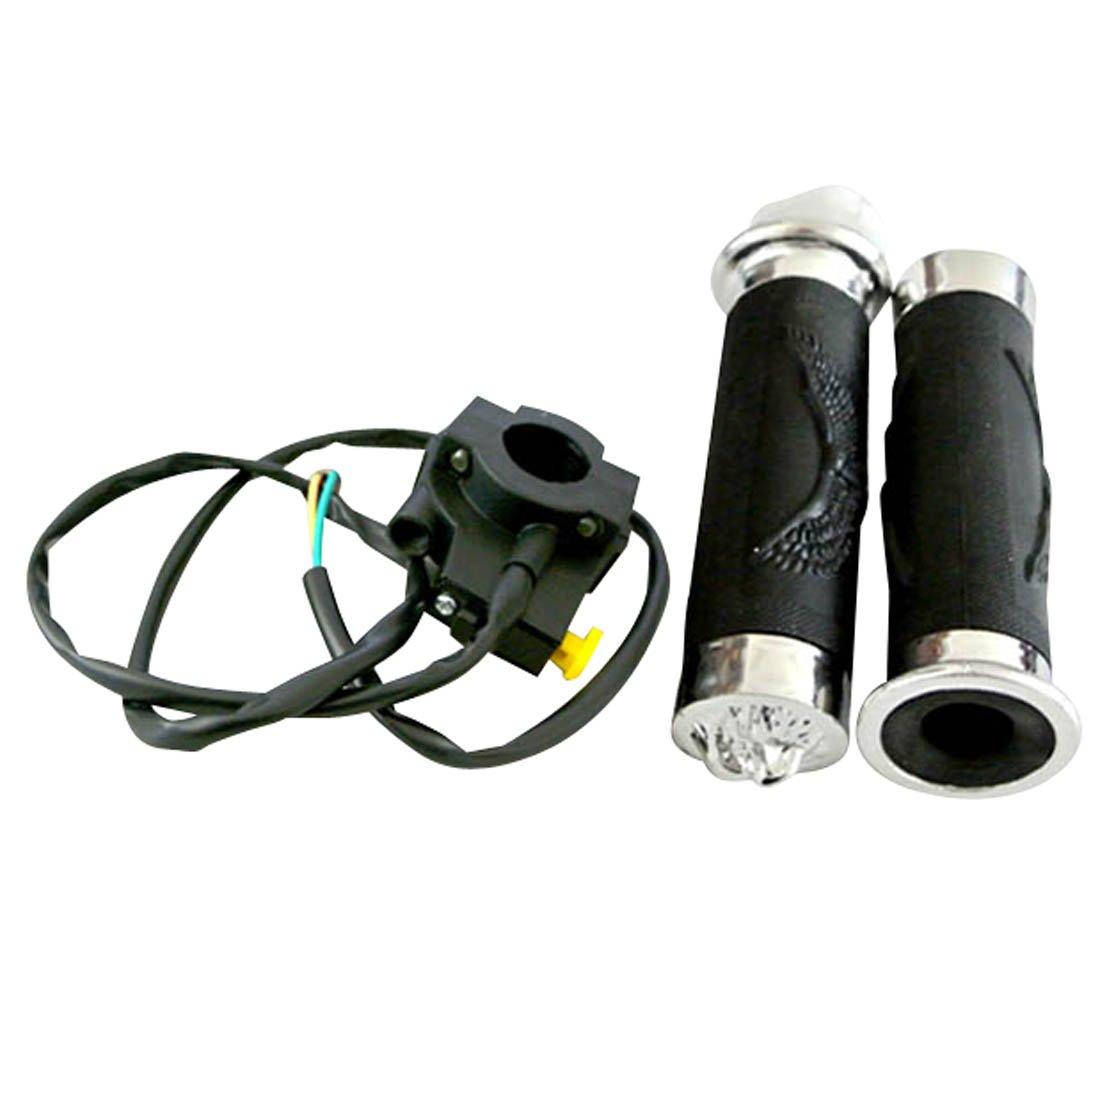 Piston Rings JRL Engine Motor Kit For 2-Stroke 80Cc Motorized Bicycle